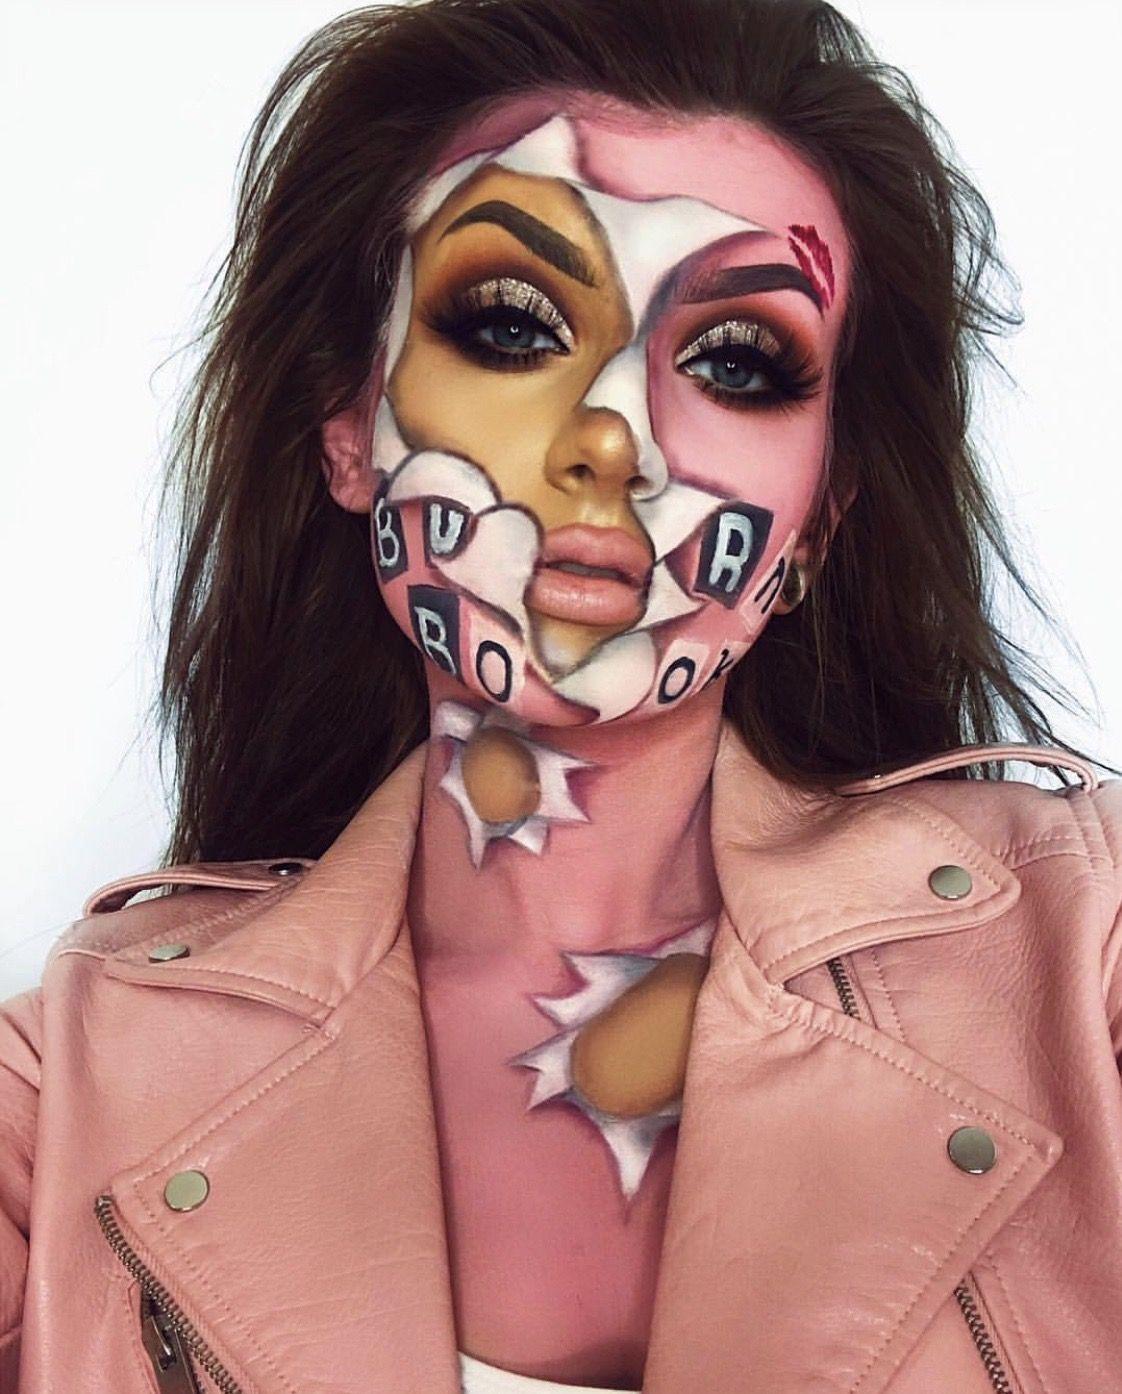 Burn Book Halloween Makeup Halloween makeup looks, Cool